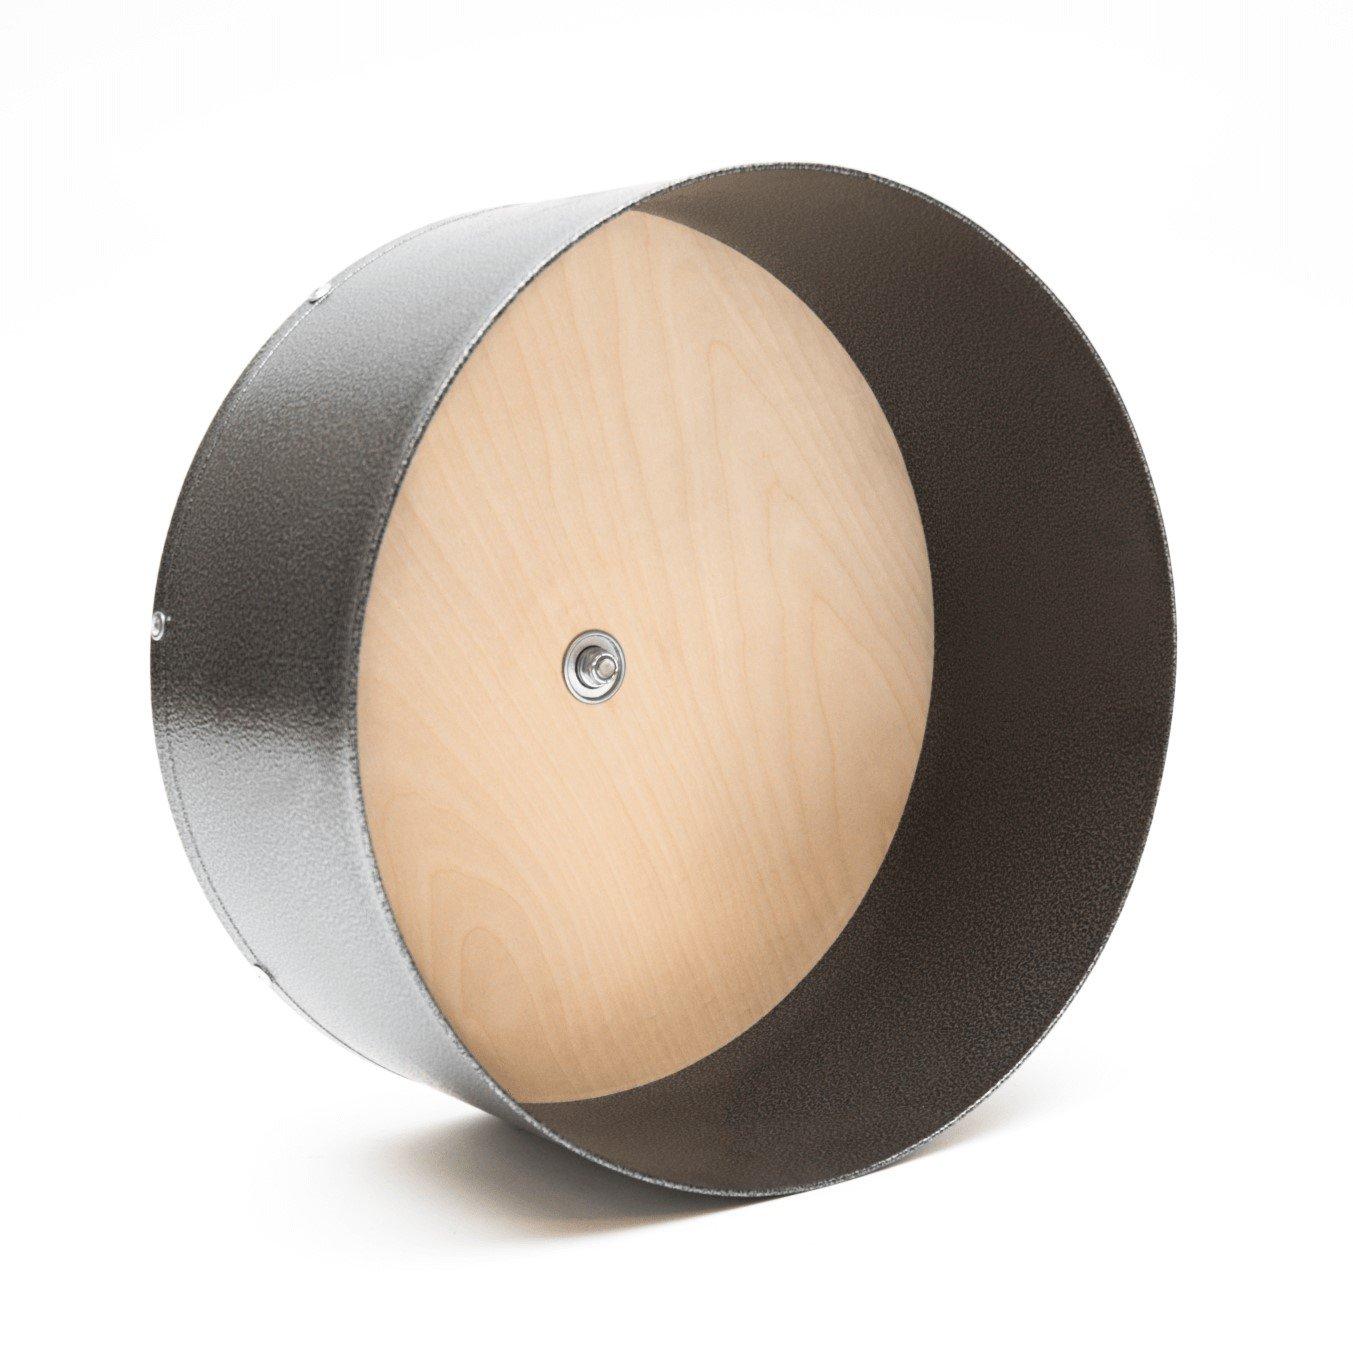 15'' Chin Spin - Chinchilla Wheel - Handmade in USA